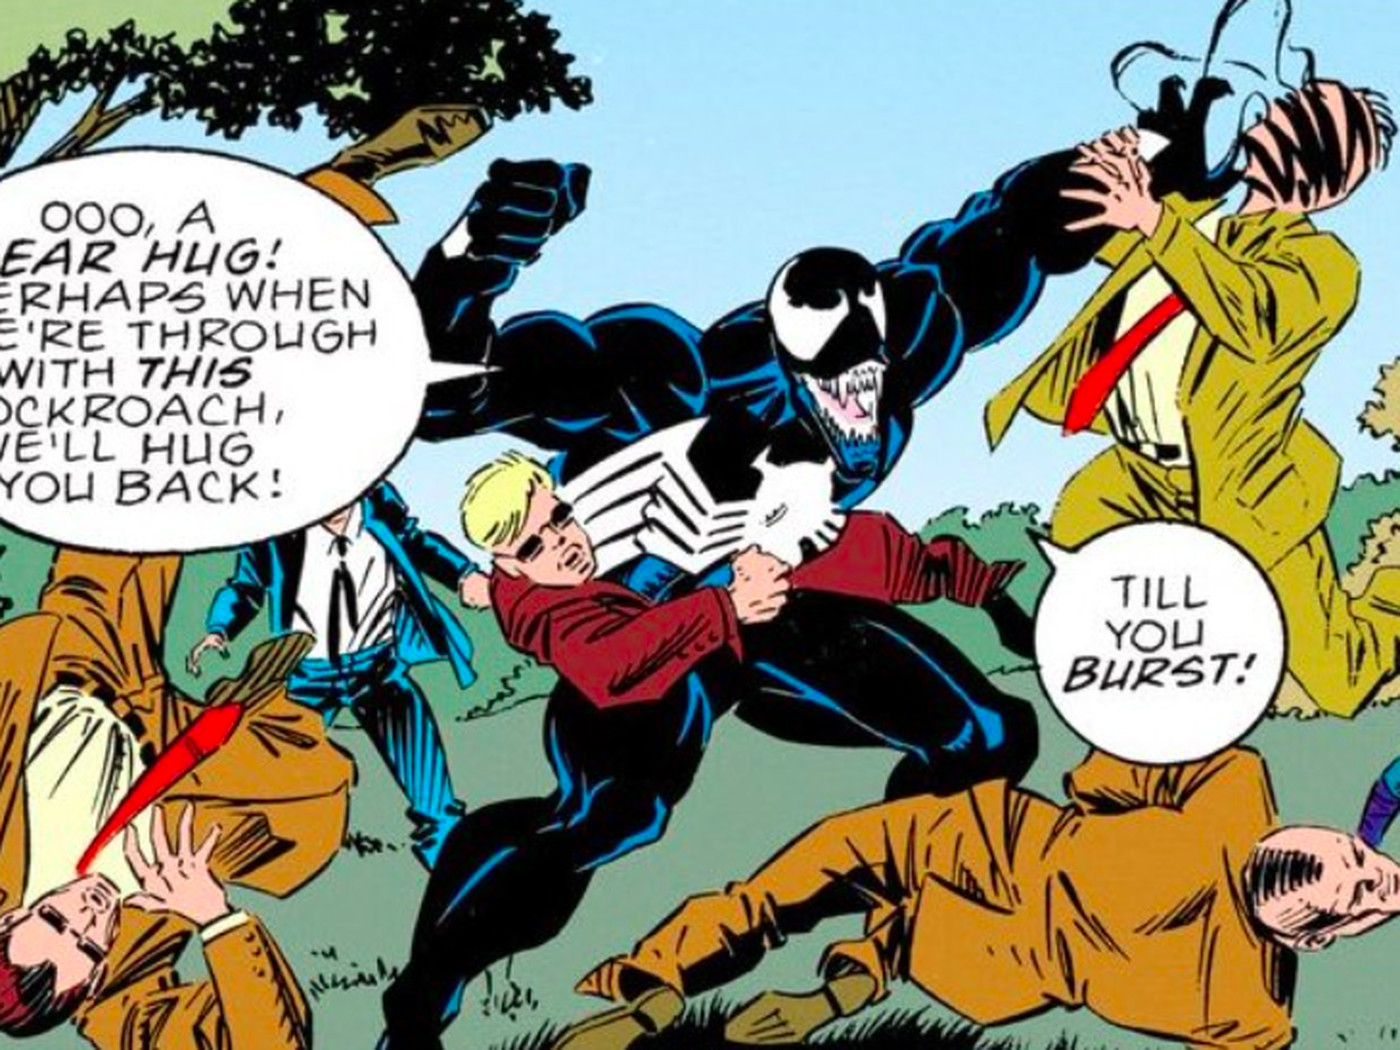 Venom The Spider Man Supervillain Explained Vox